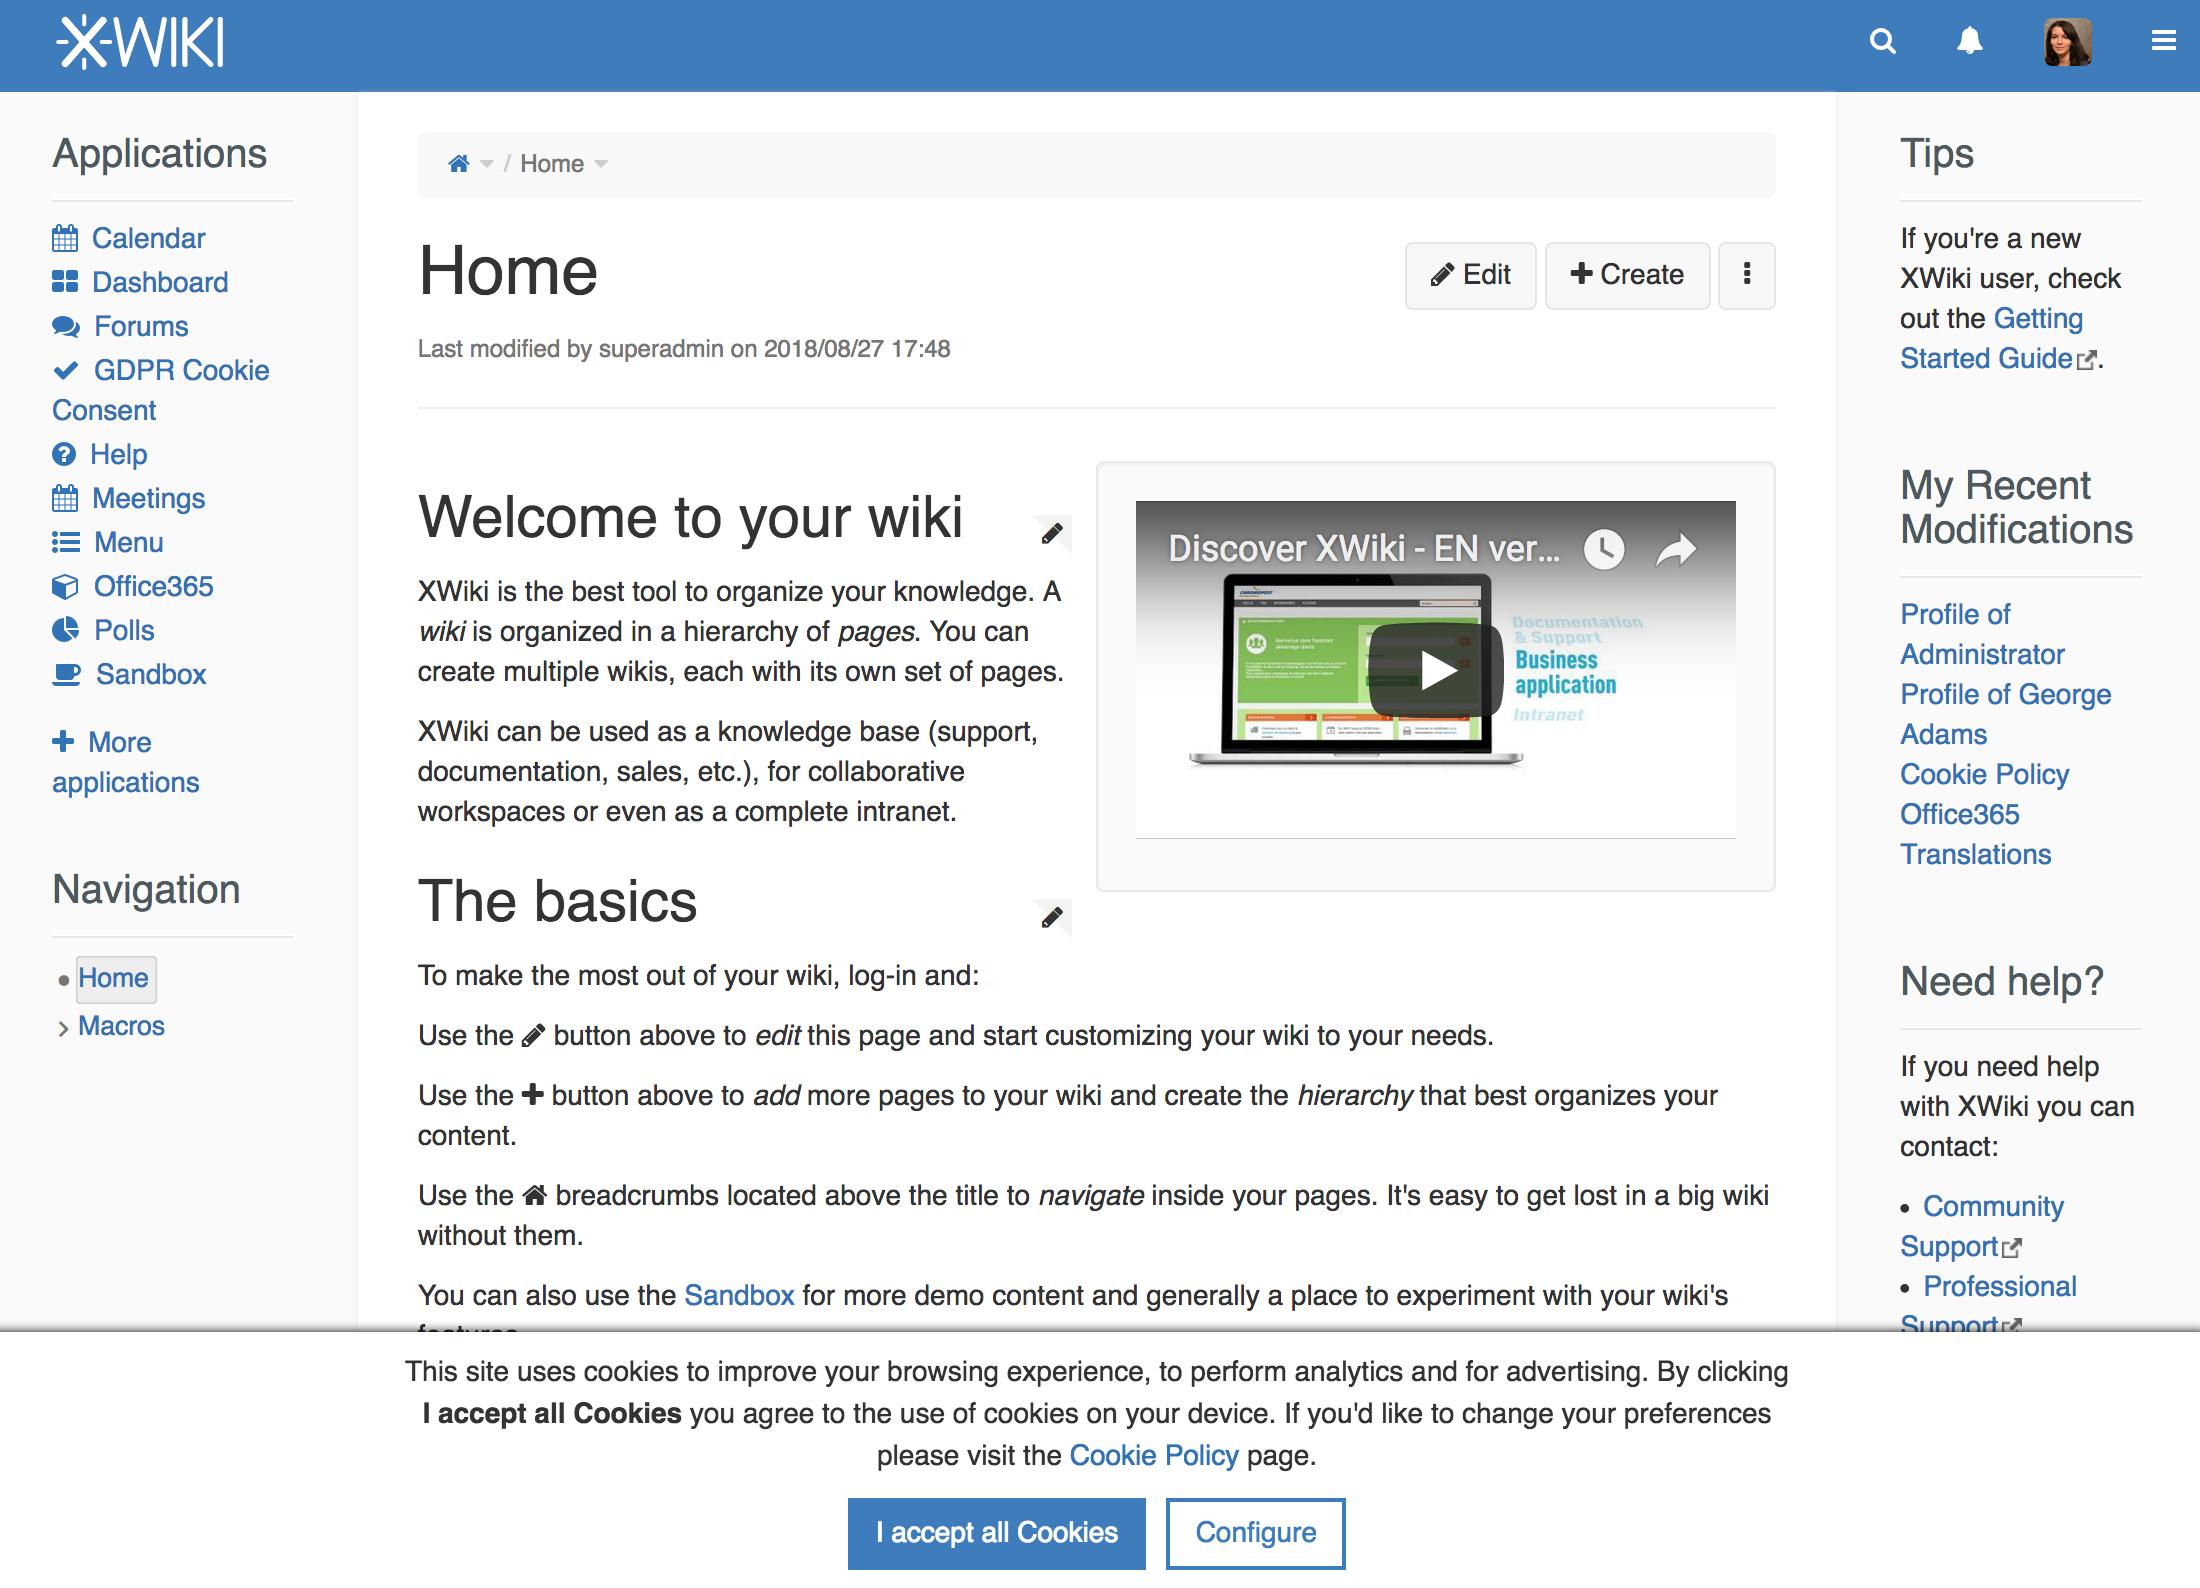 https://store.xwiki.com/xwiki/bin/download/Extension/GDPRCookieConsent/WebHome/CookieBanner1.png